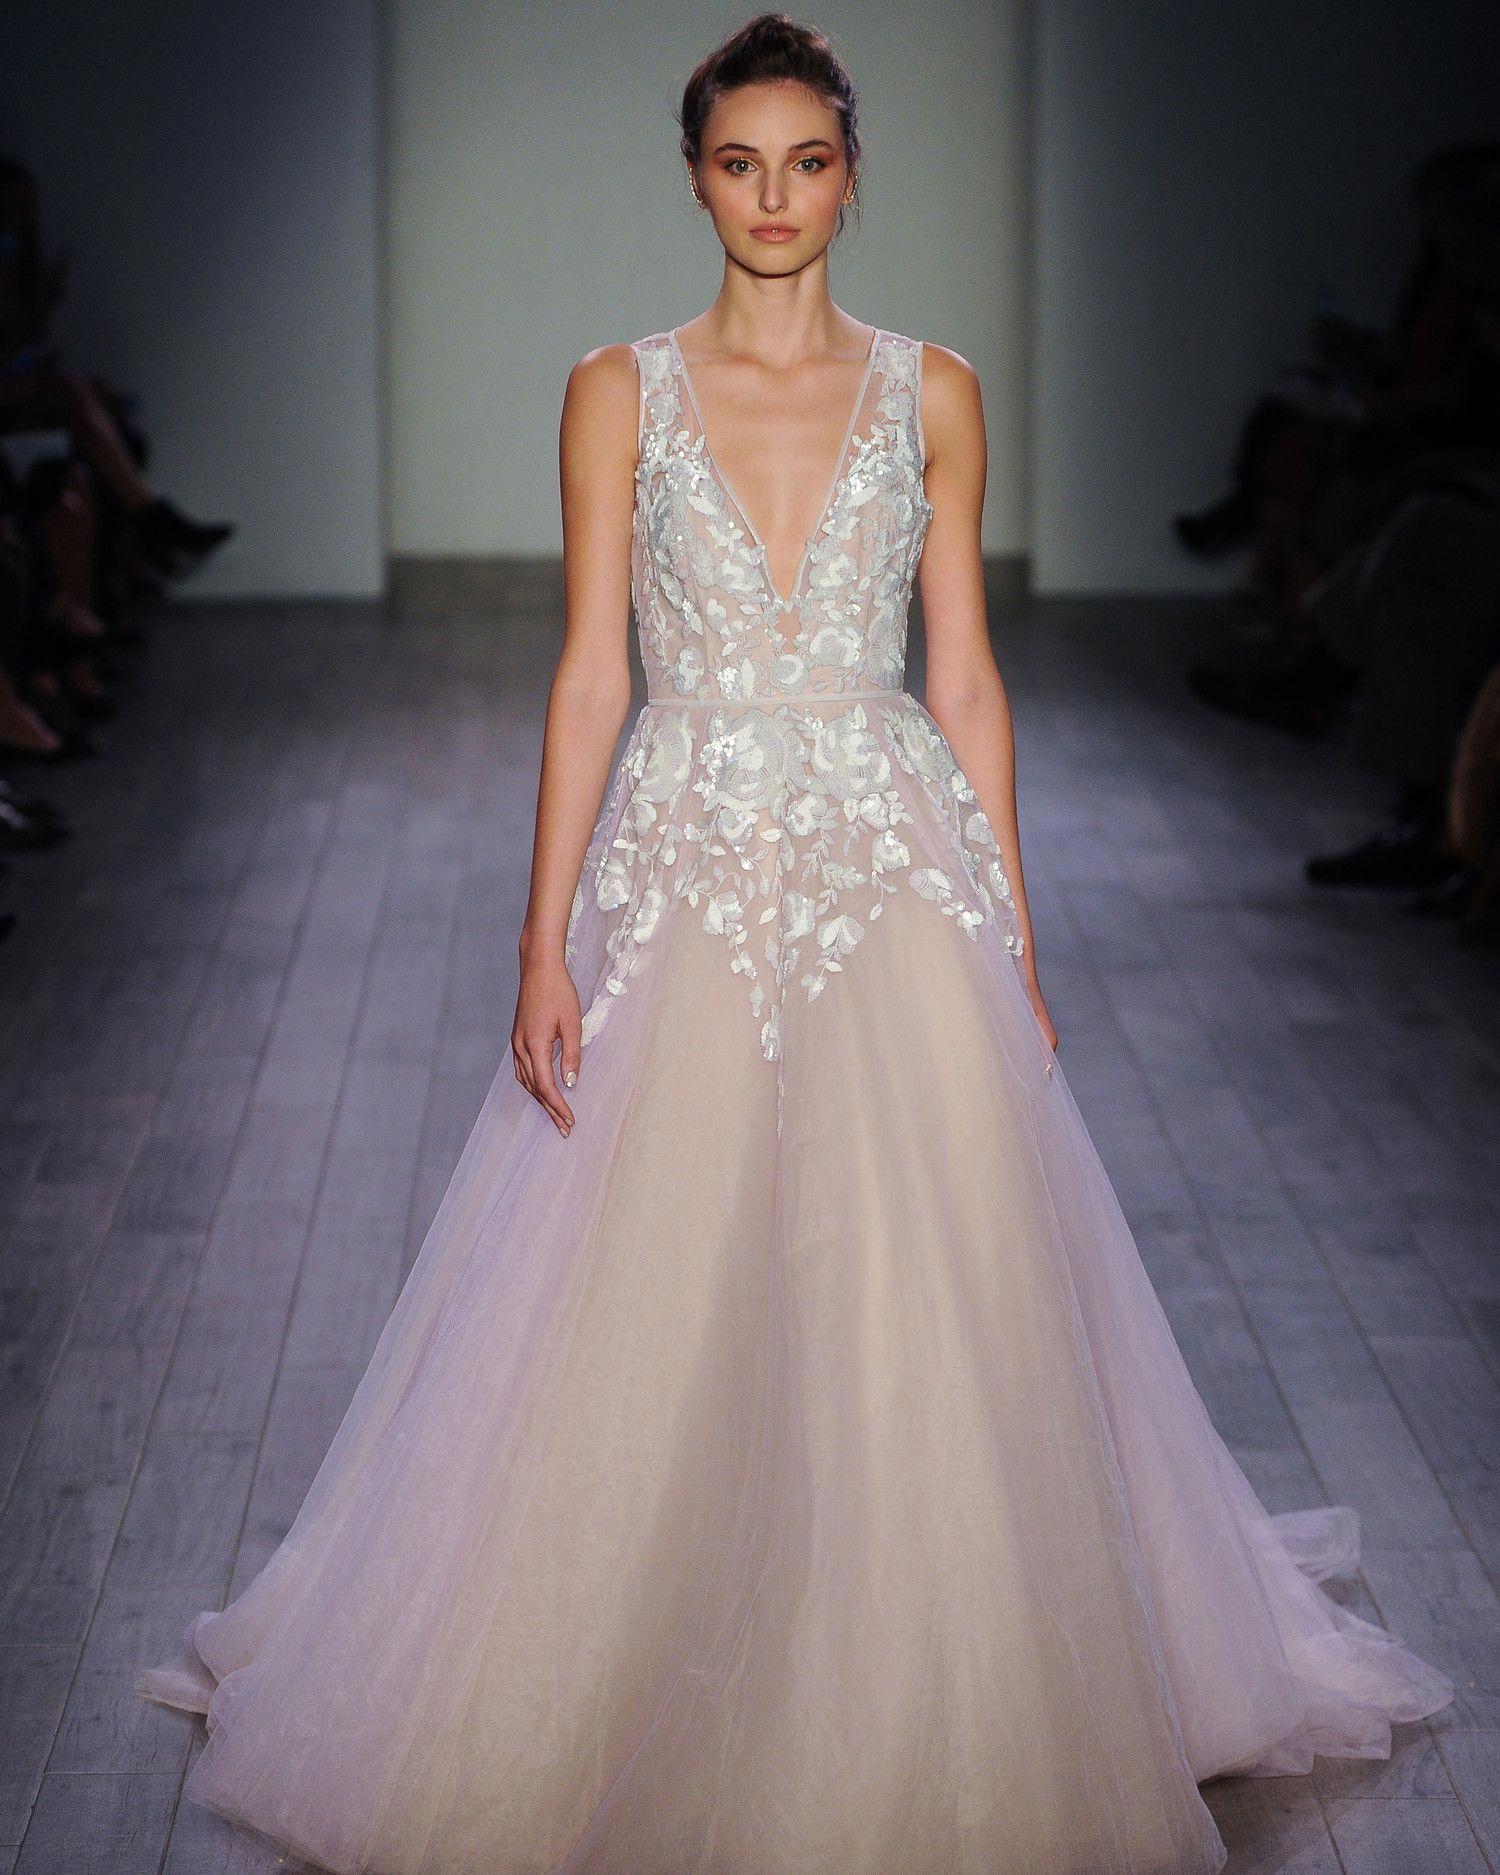 Conservative wedding dresses  Hayley Paige simpleelegantweddingdress  Dream Wedding Dresses